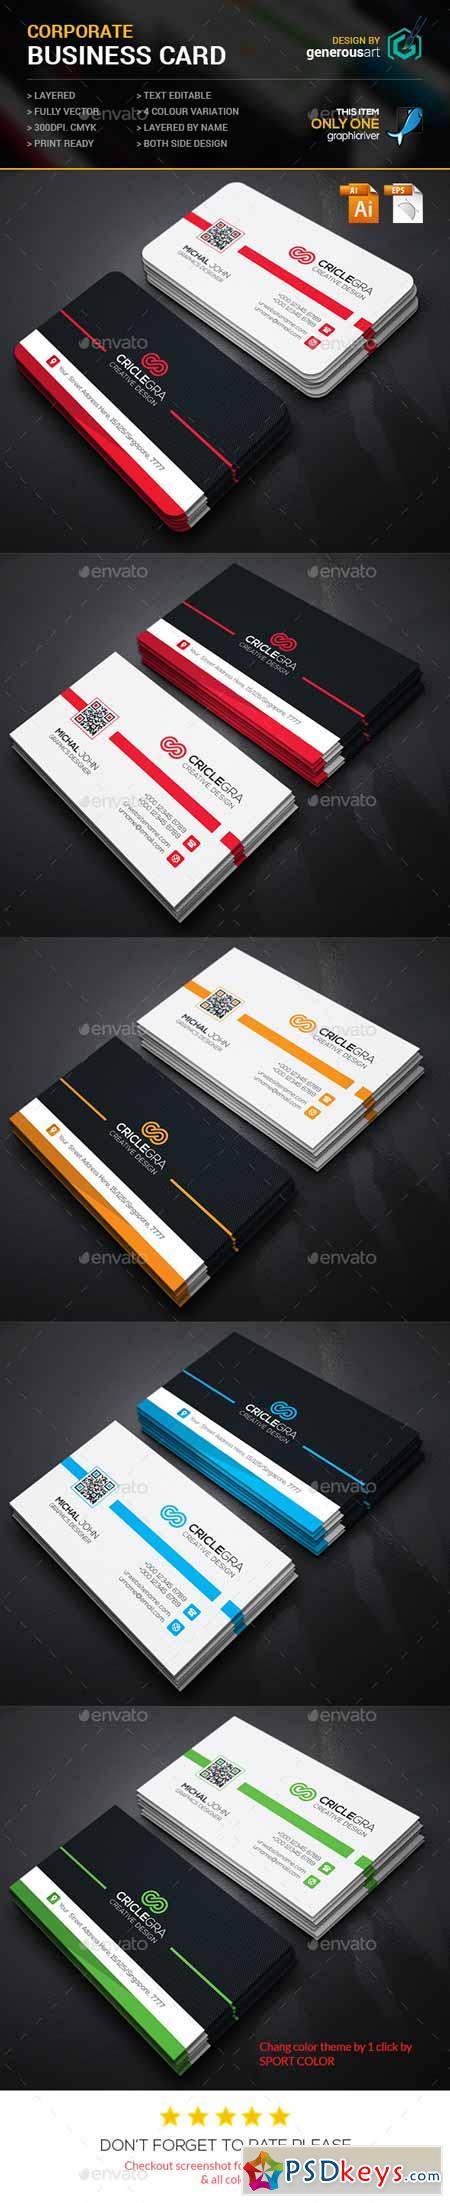 Criclegra Corporate Business Card 11865180